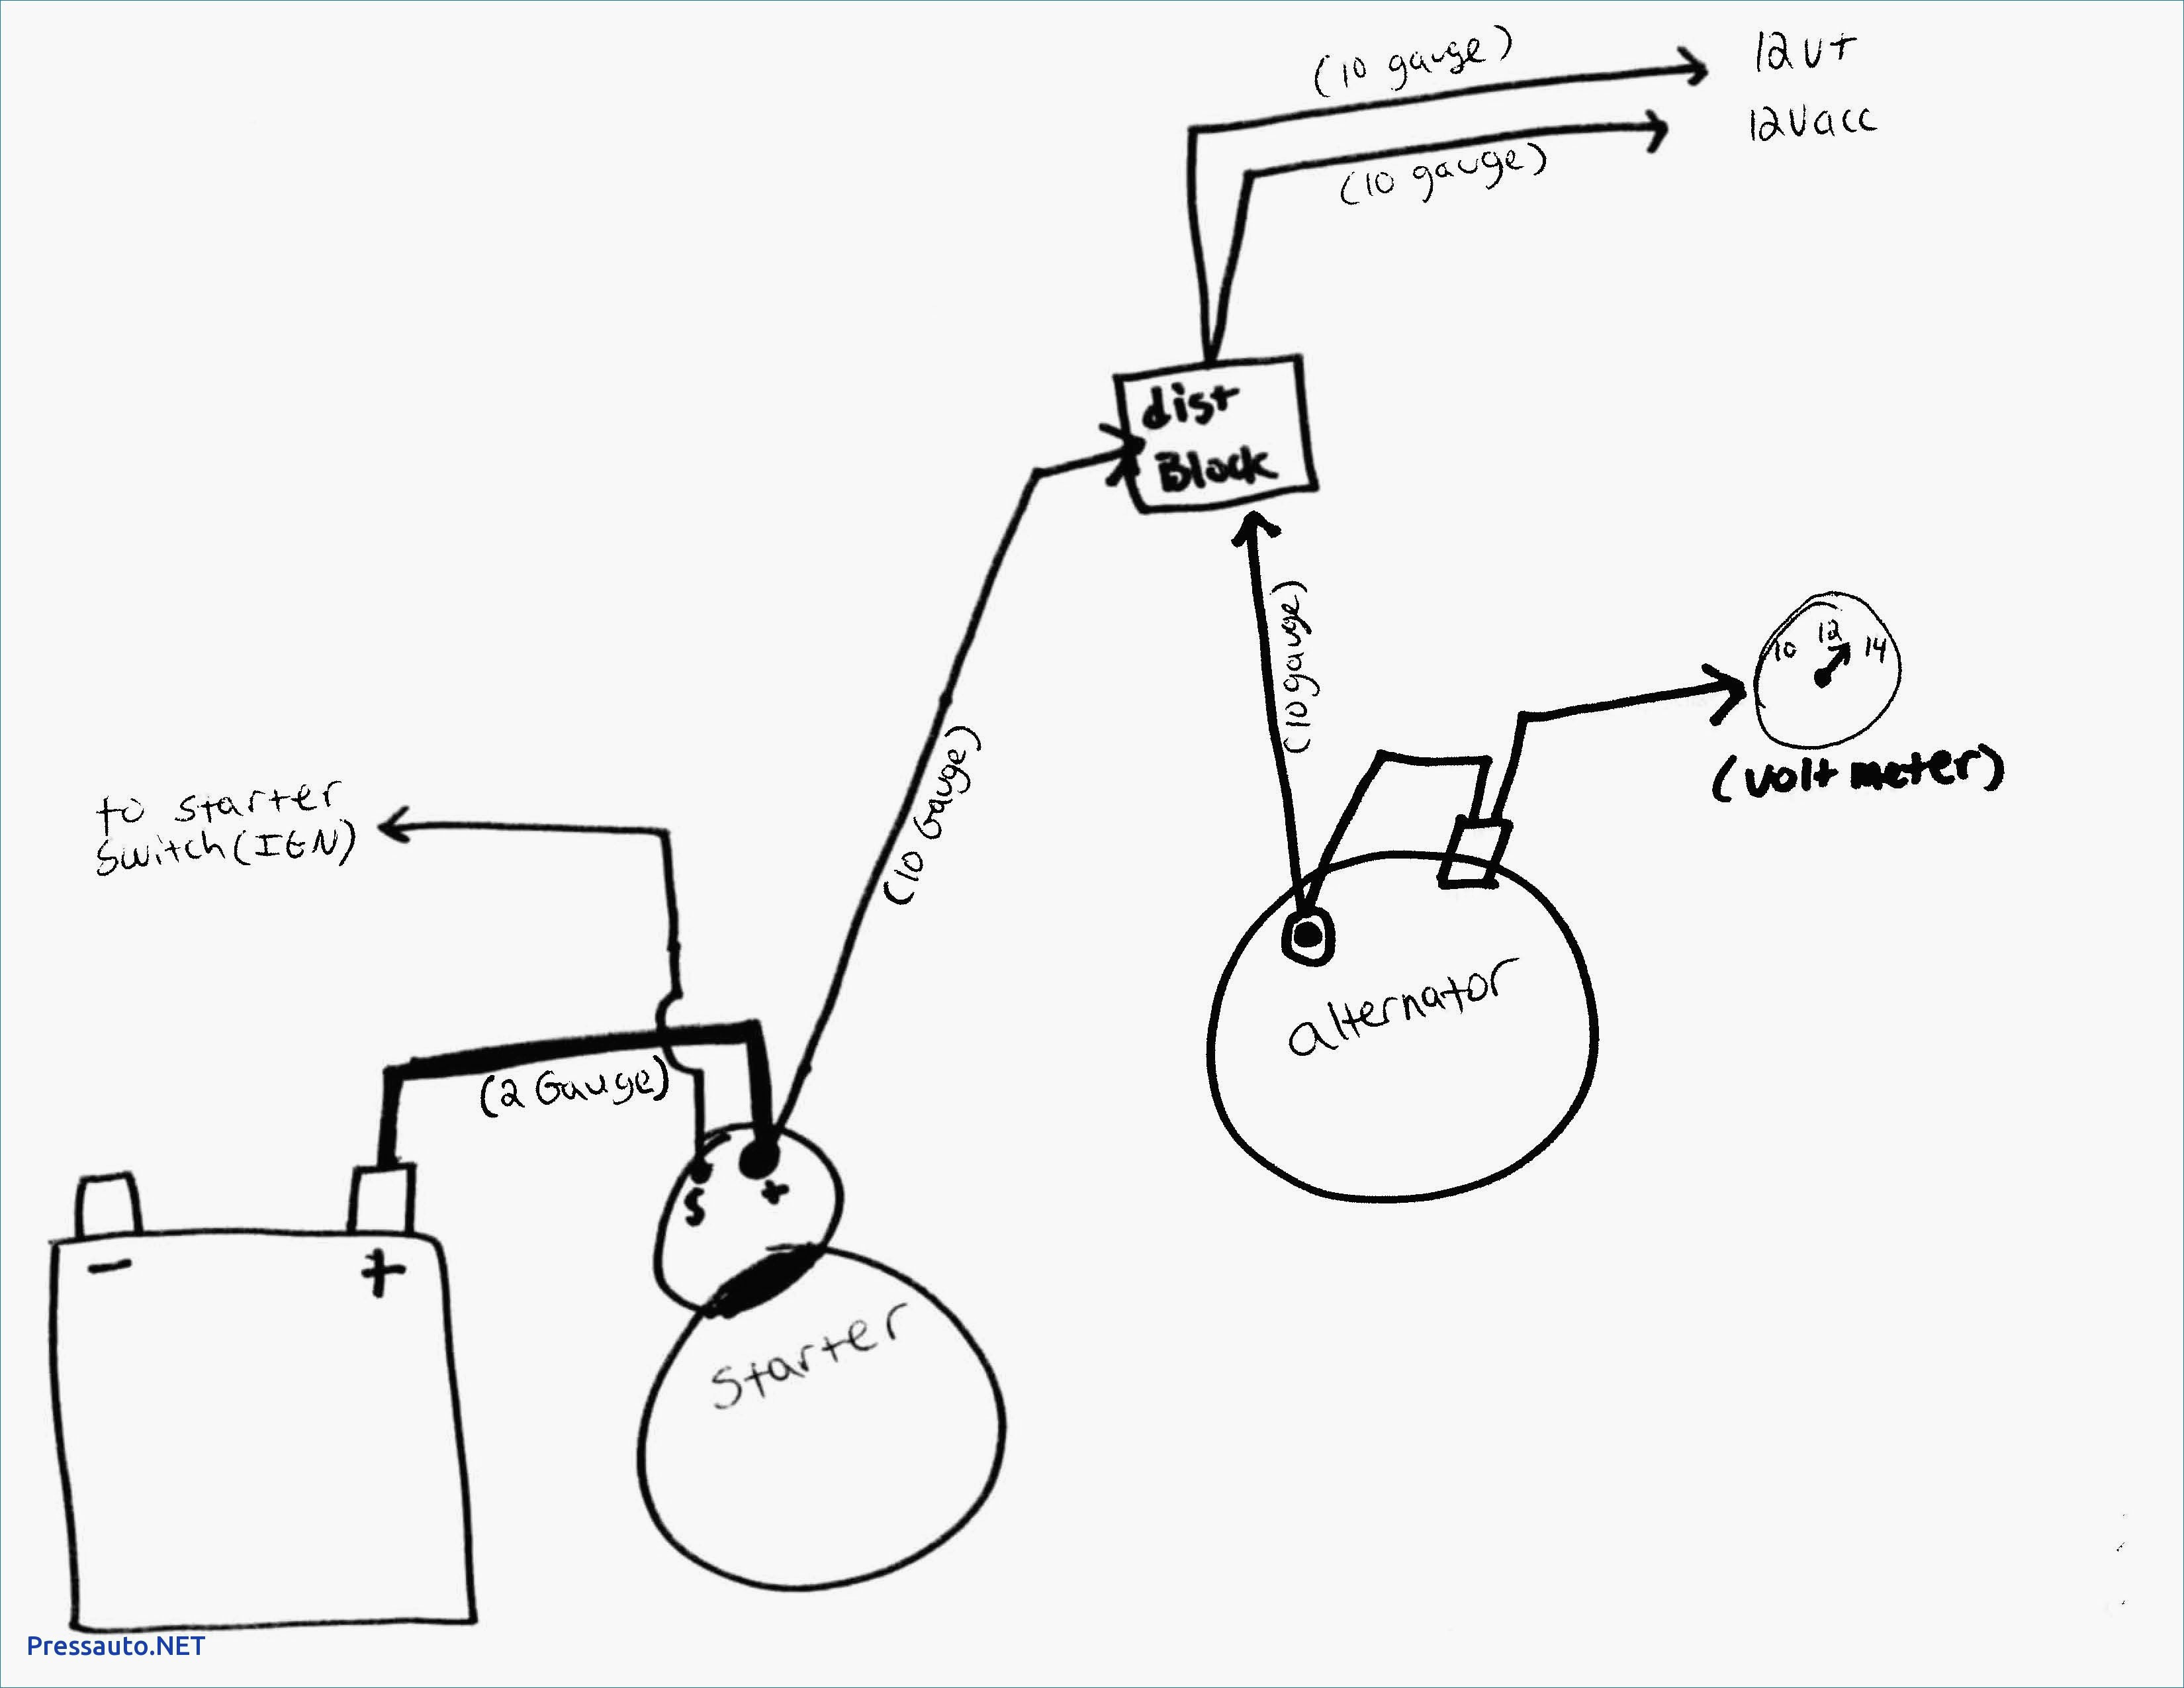 Delco 3 Wire Alternator Wiring Diagram Simple Alternator Wiring - Simple Alternator Wiring Diagram